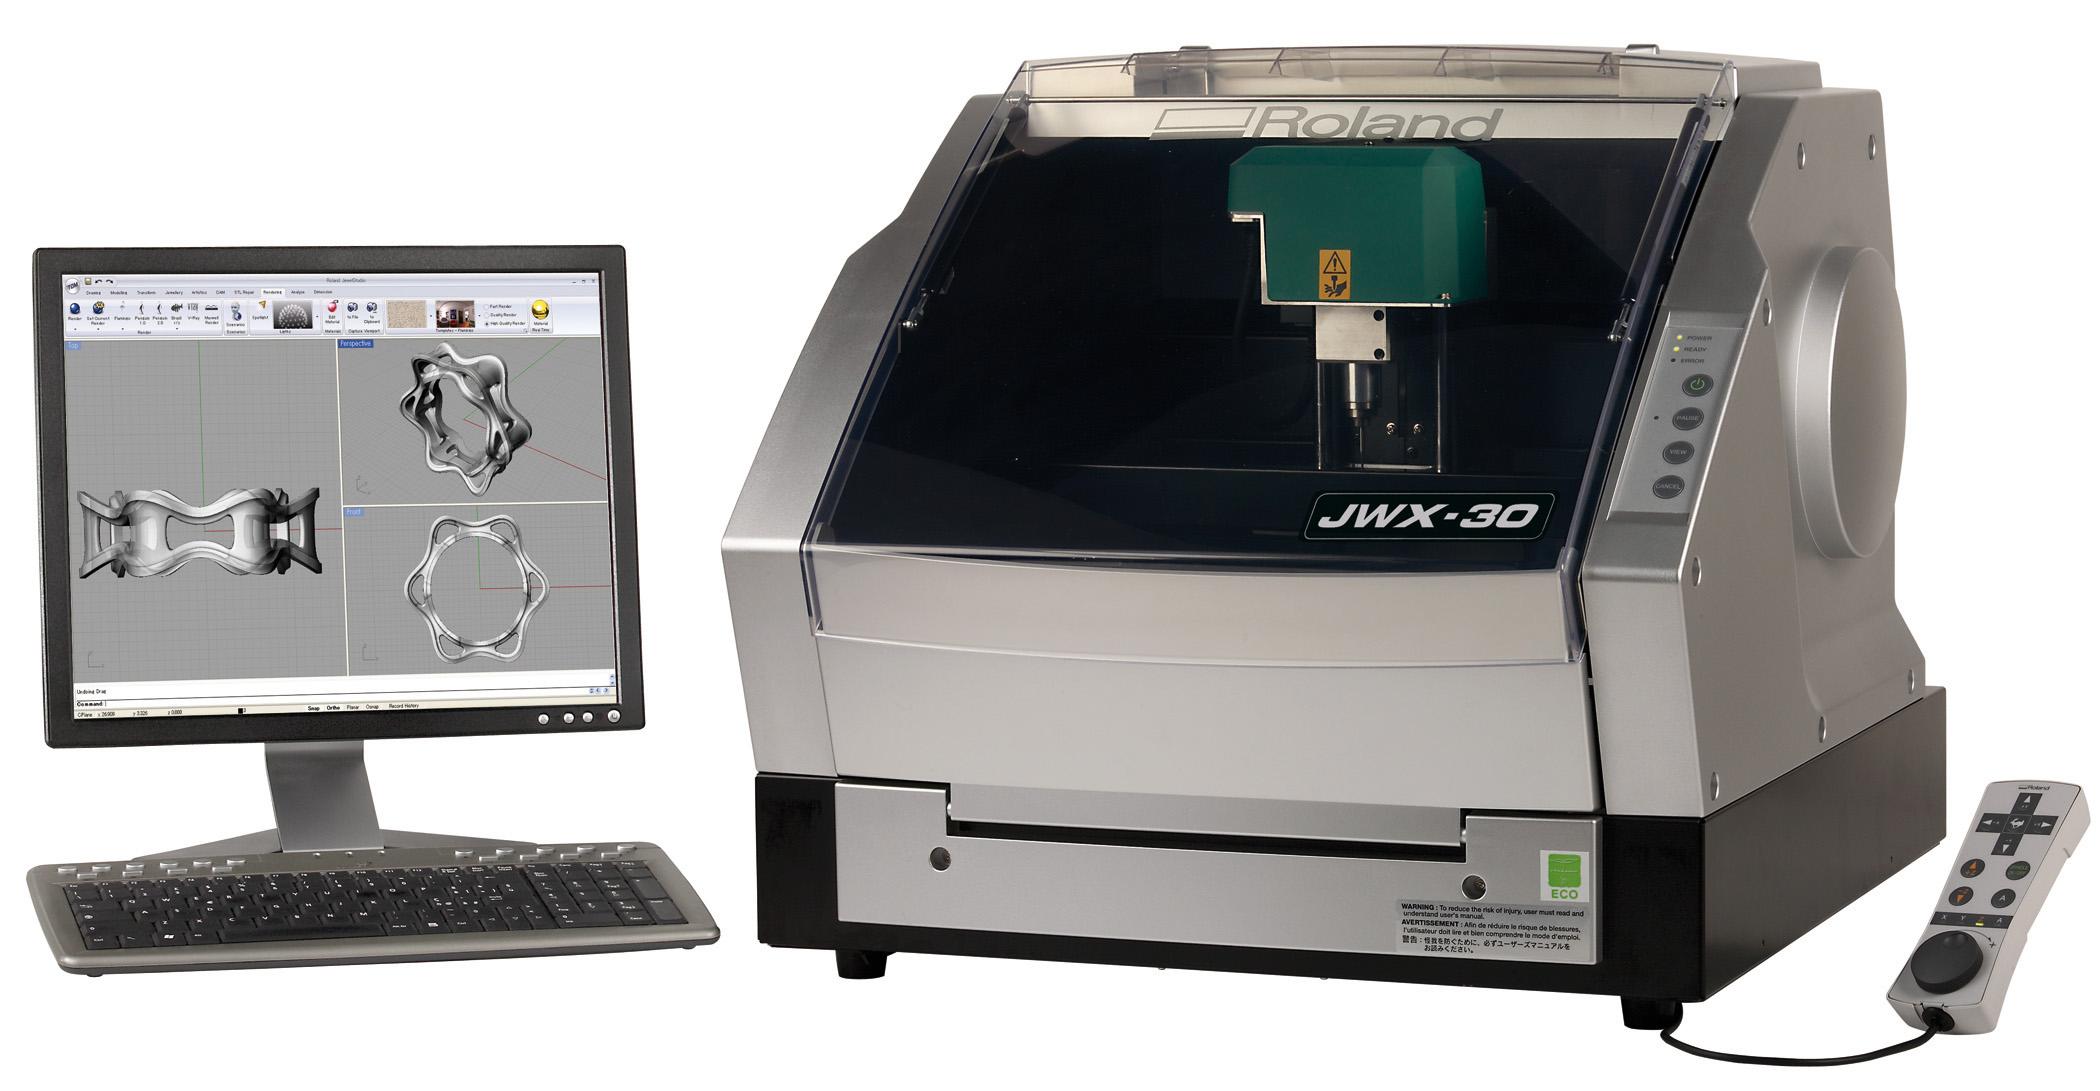 OLYMP ELECTRONIC COM - ROLAND SRBIJA BEOGRAD JUVELIR ZLATAR MODELAR JWX-30